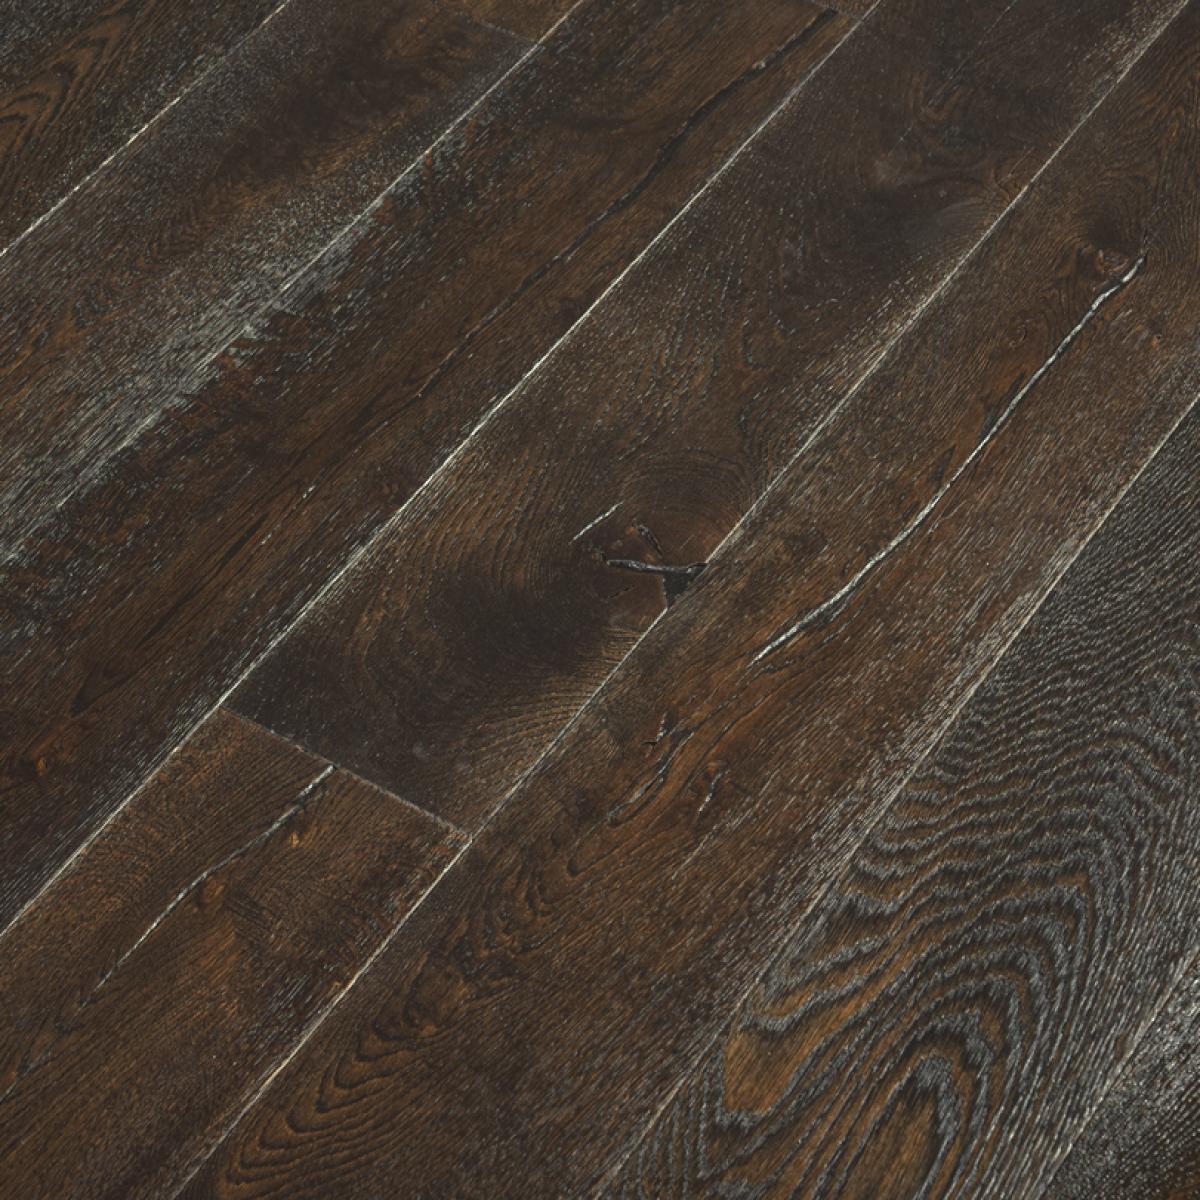 Reclaimed Oak Engineered Wood Flooring, Dark Oak Wood Laminate Flooring